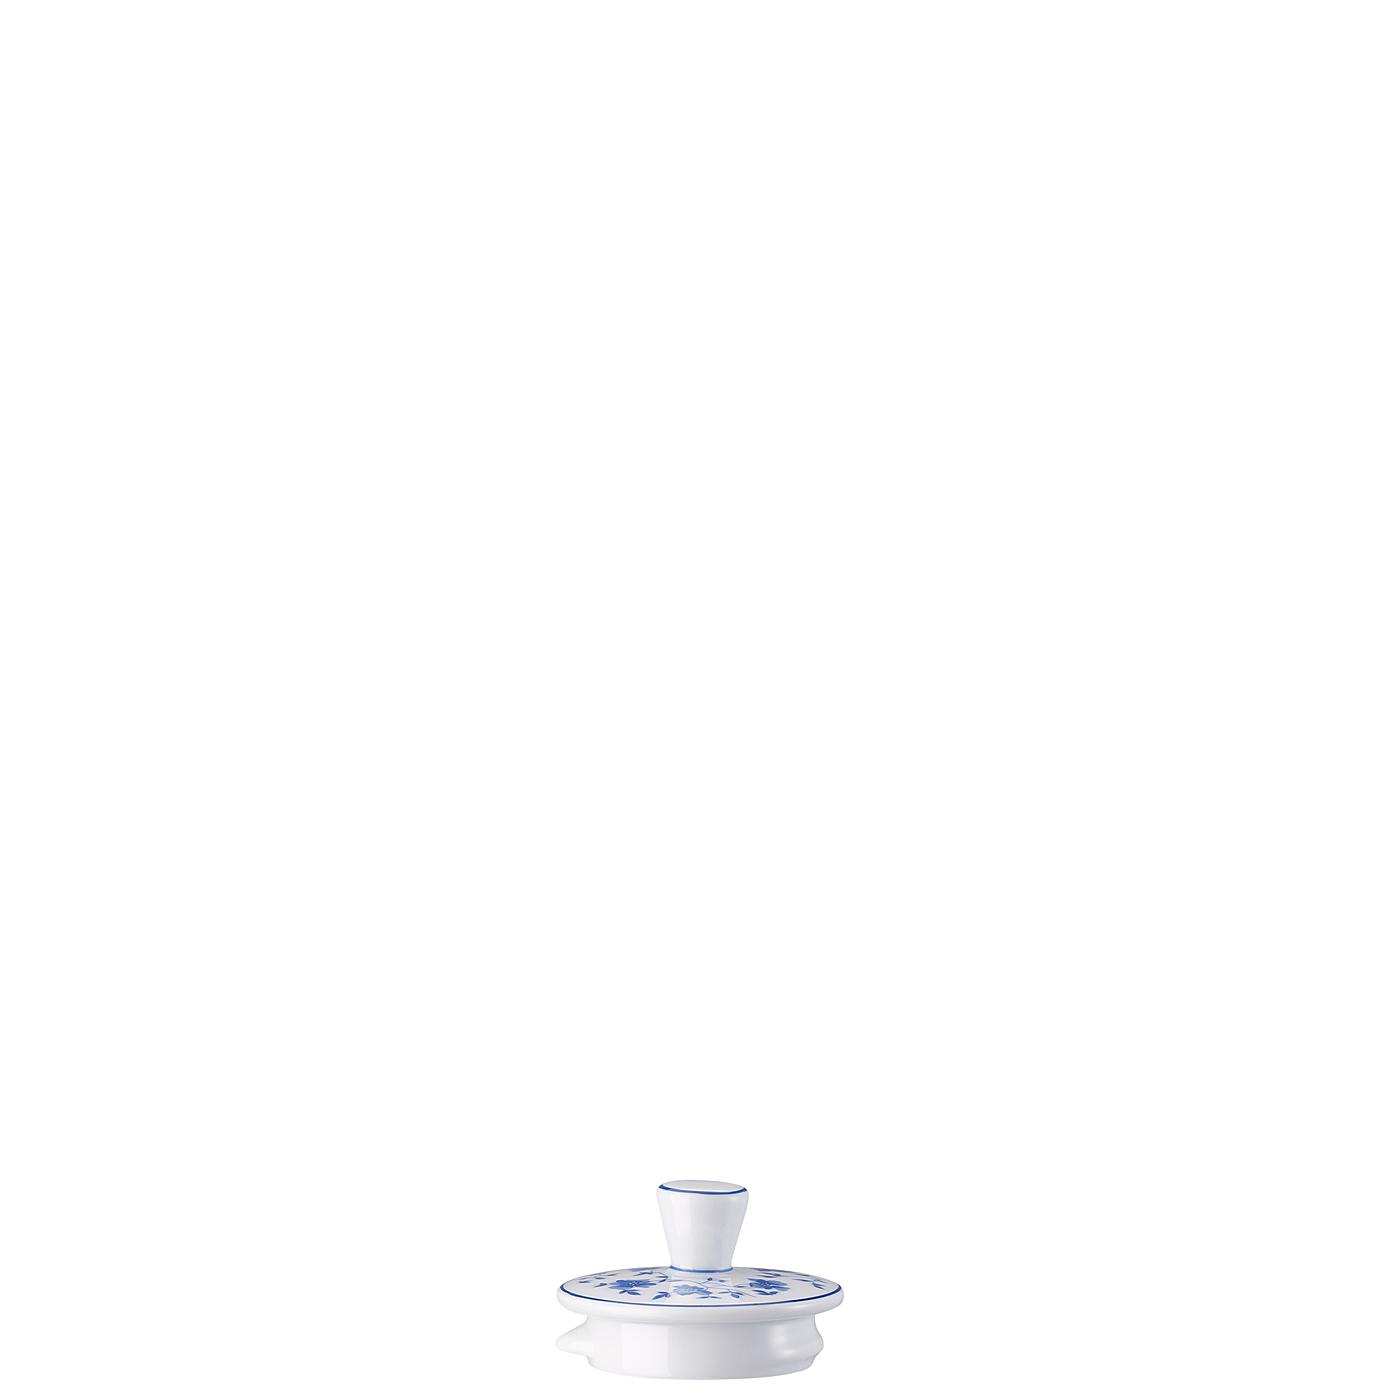 Kaffeekanne 6 P. Deckel Form 1382 Blaublüten Arzberg